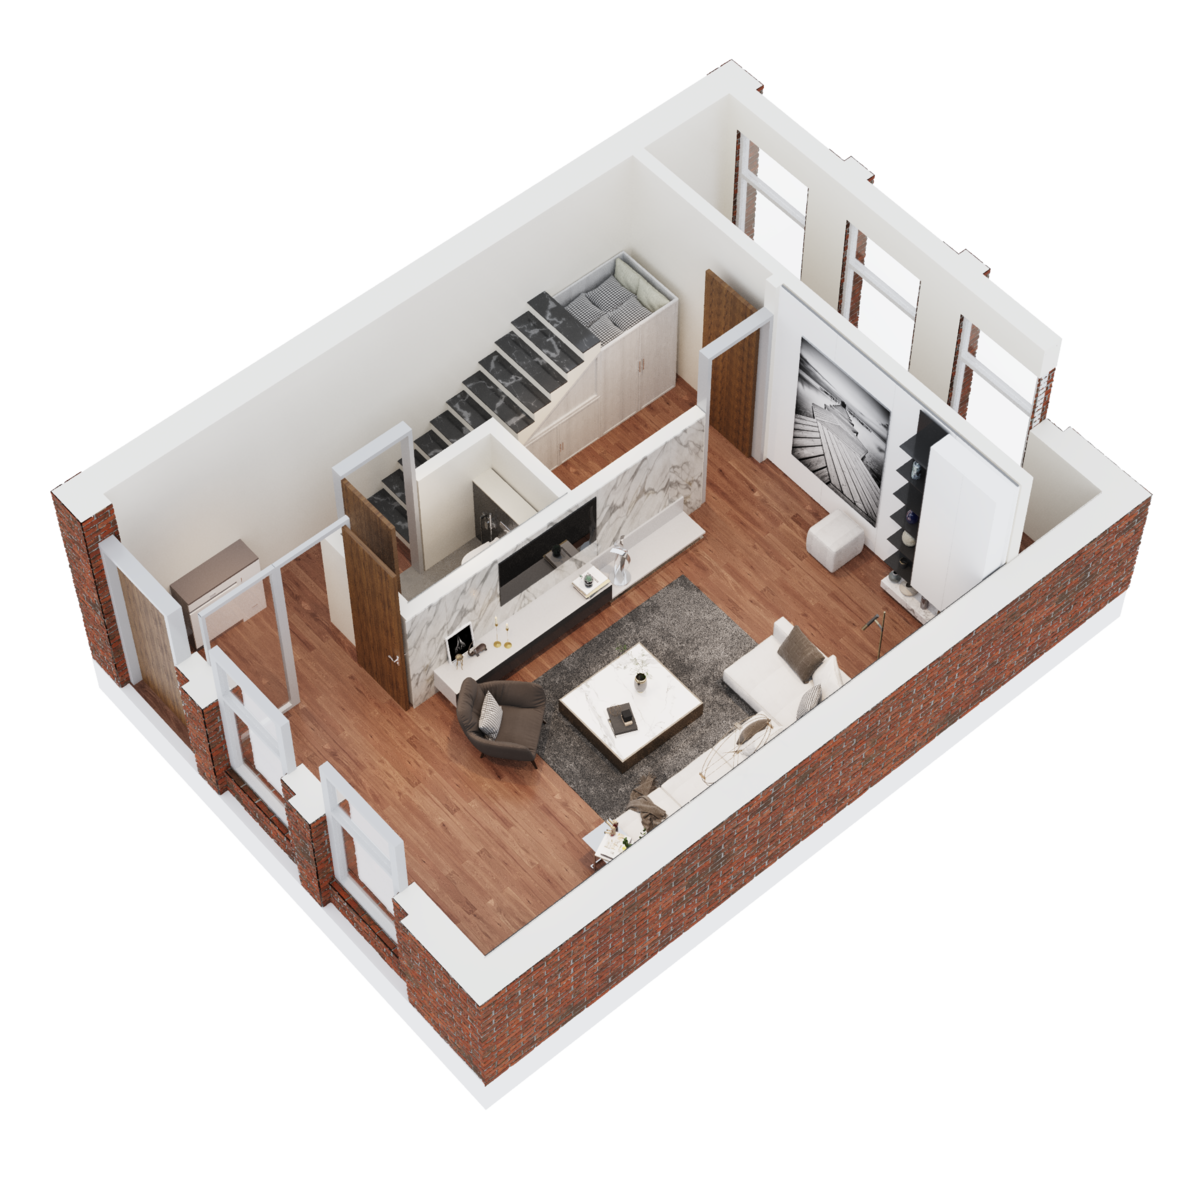 Sydenham Place, 26C Tenby Street, Jewellery Quarter floorplan 1 of 8